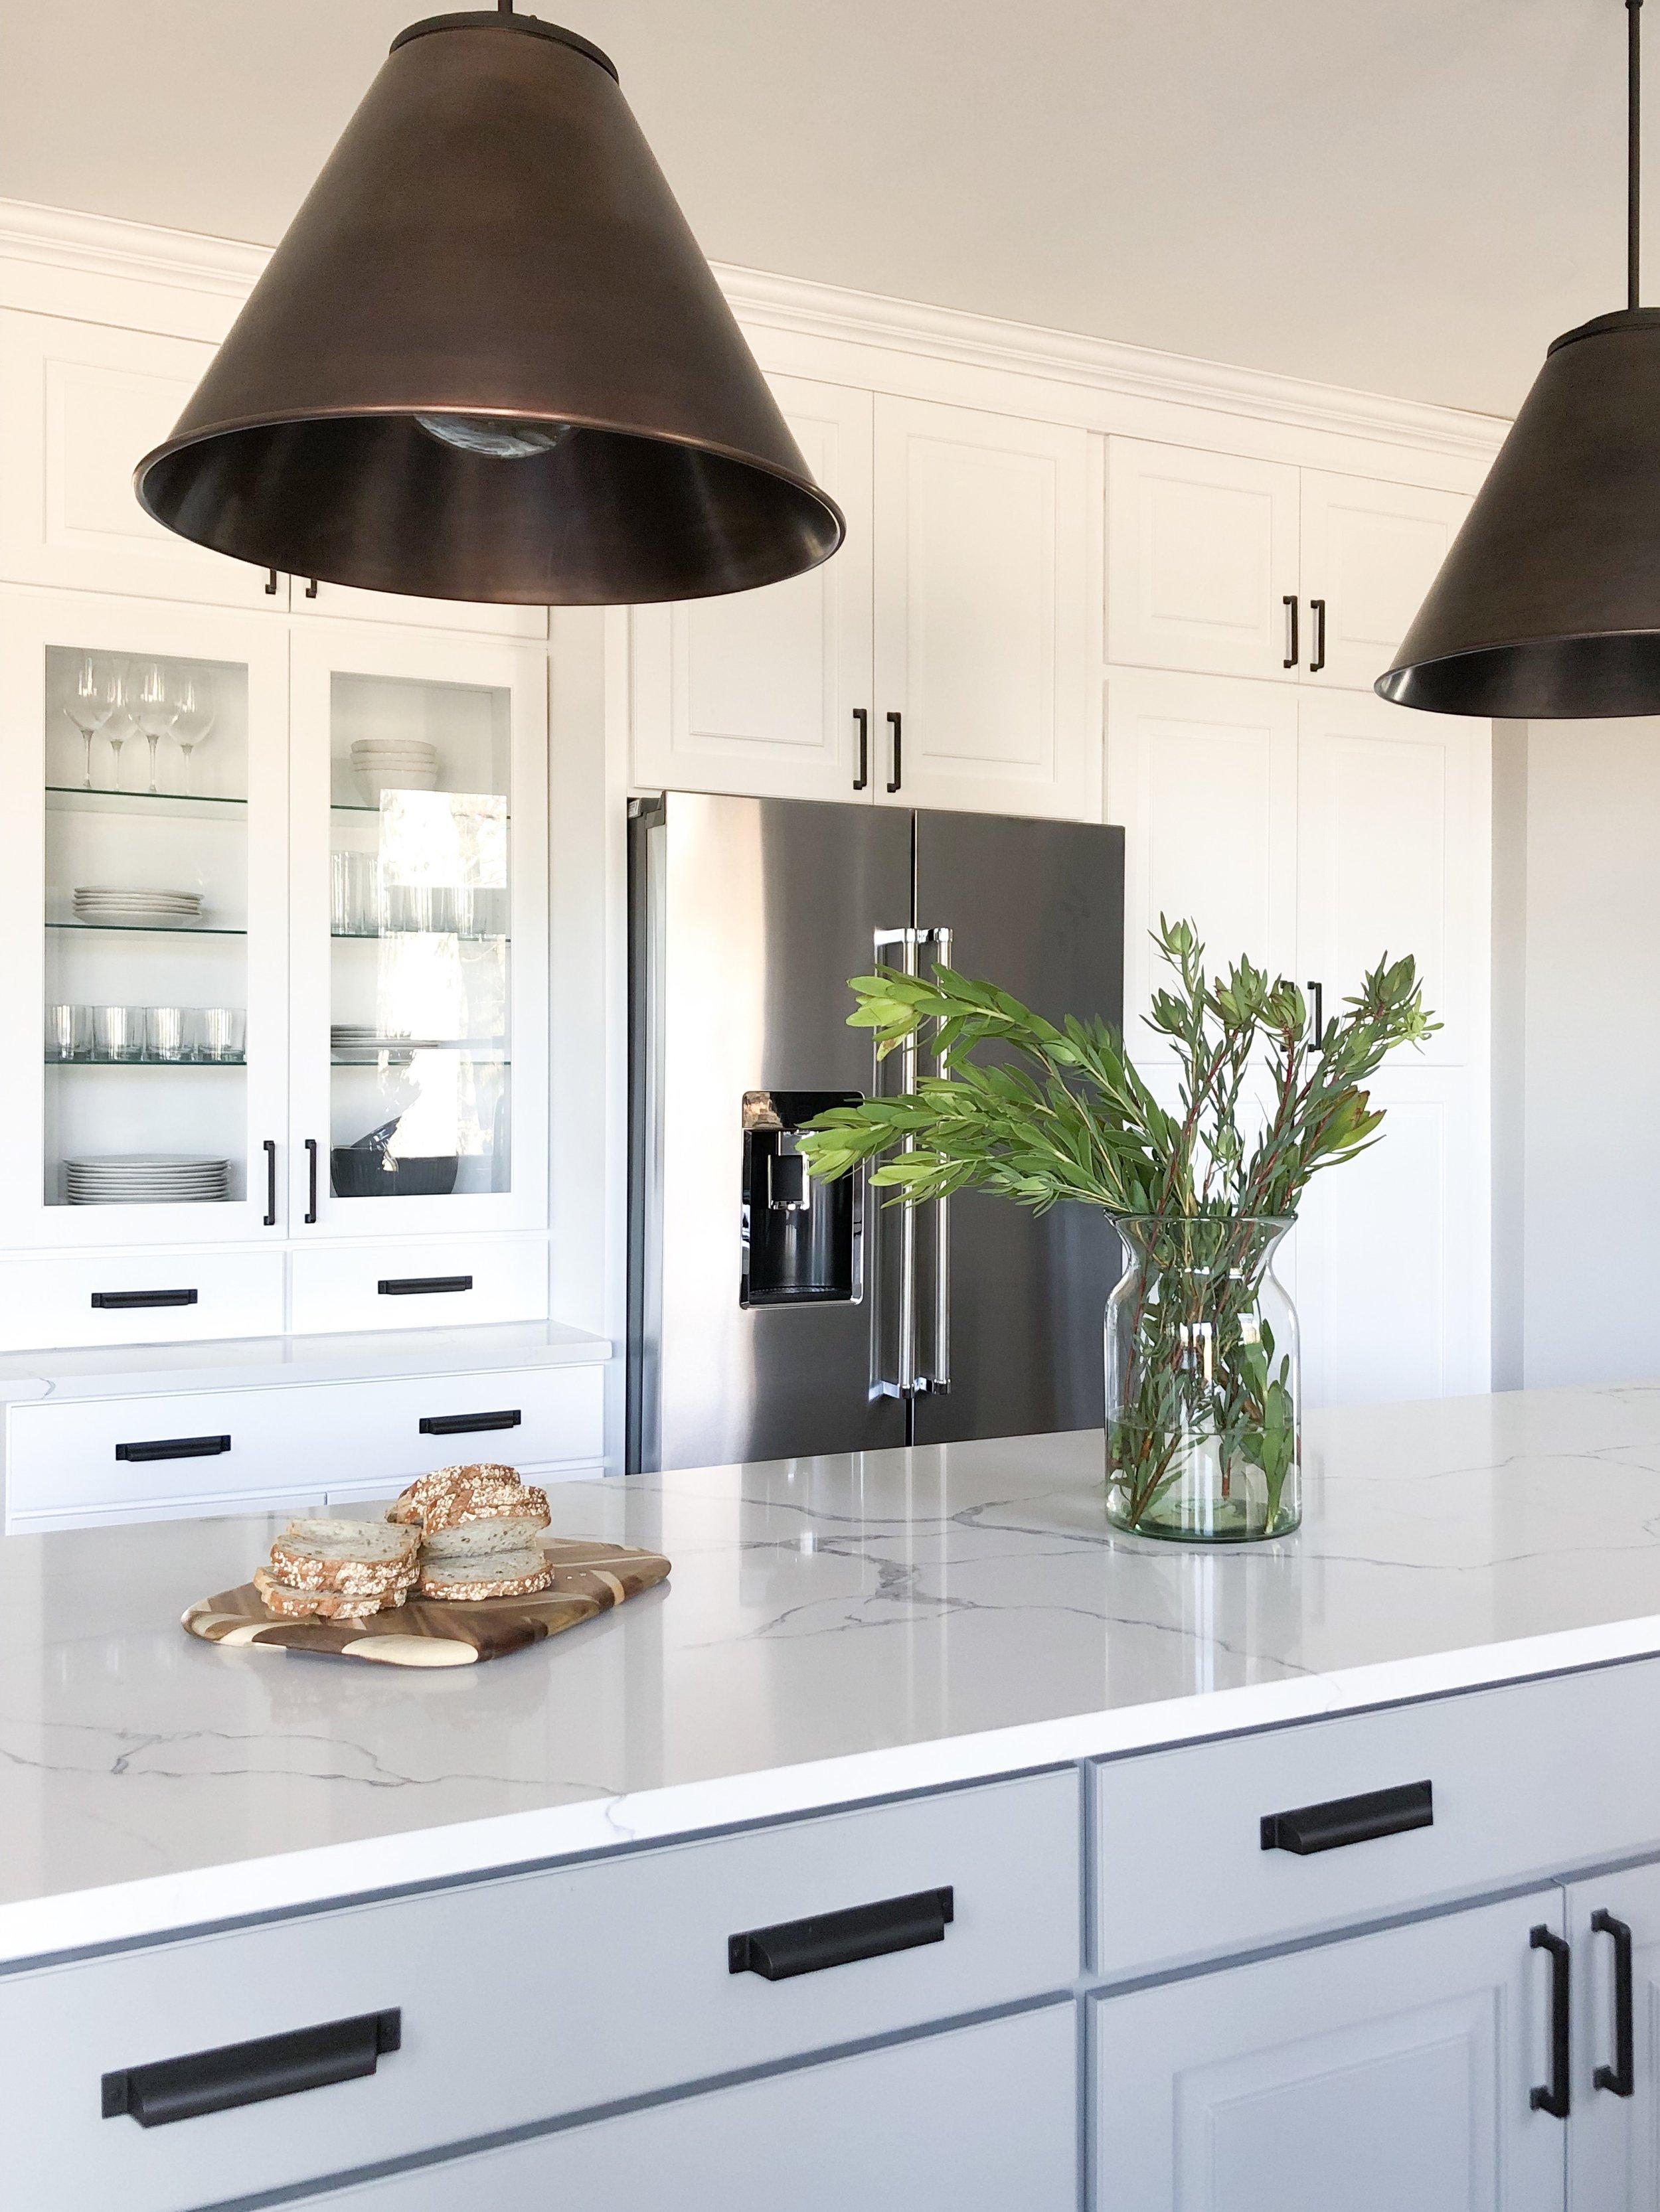 Quartz-Countertops-Large-Island-Kitchen.JPG